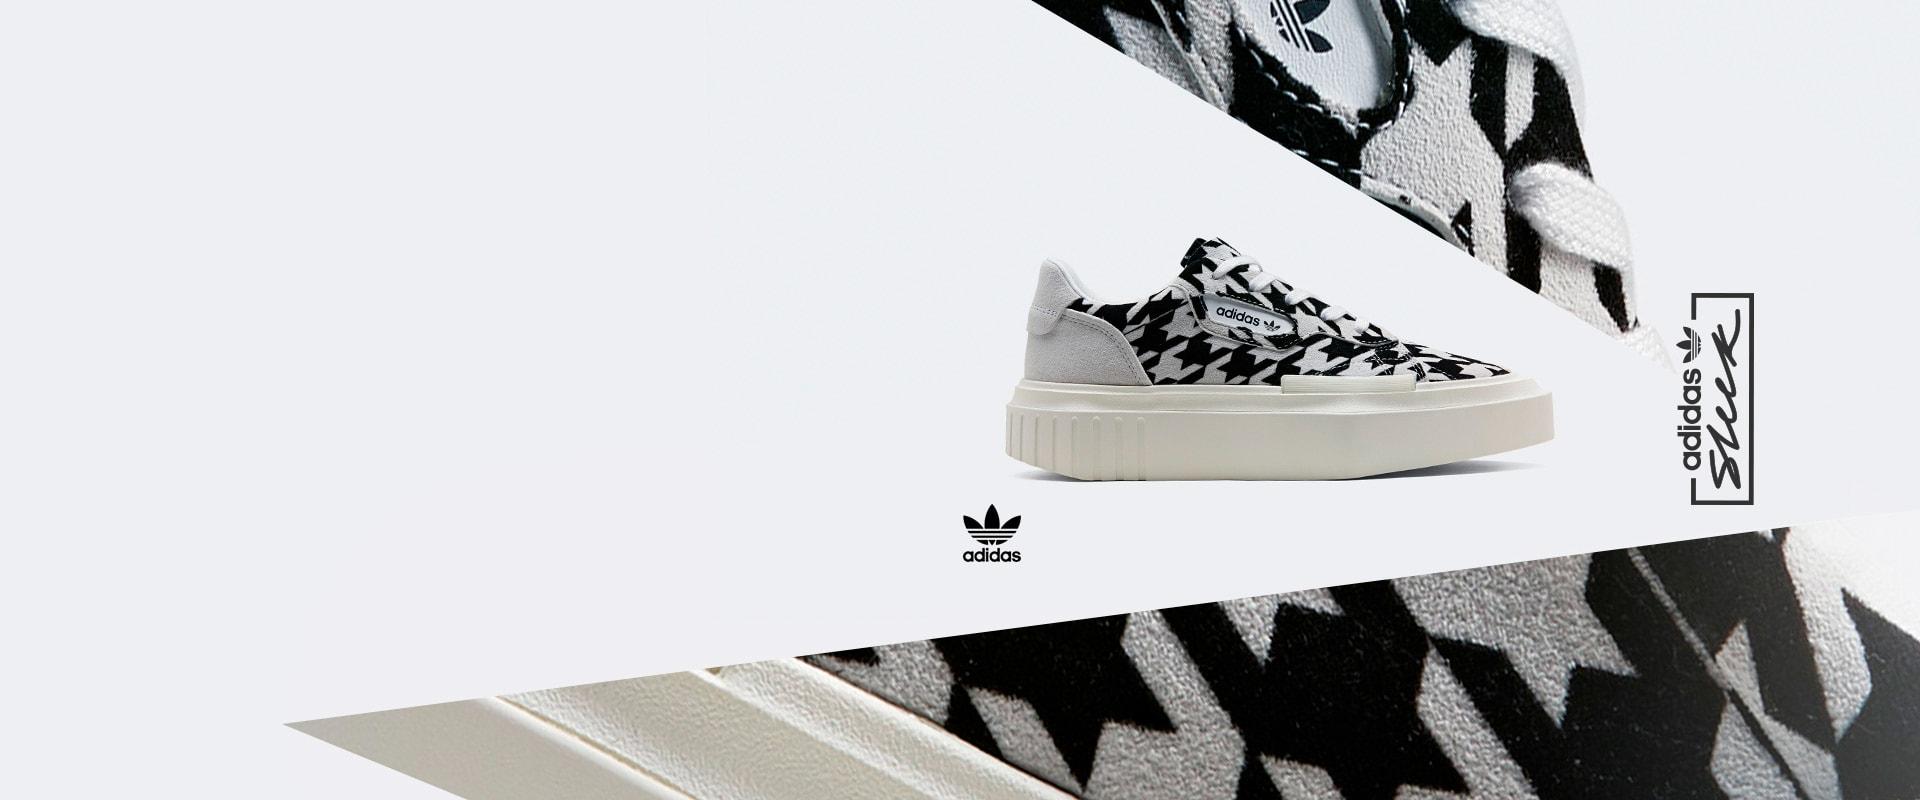 36020101f65f adidas Originals